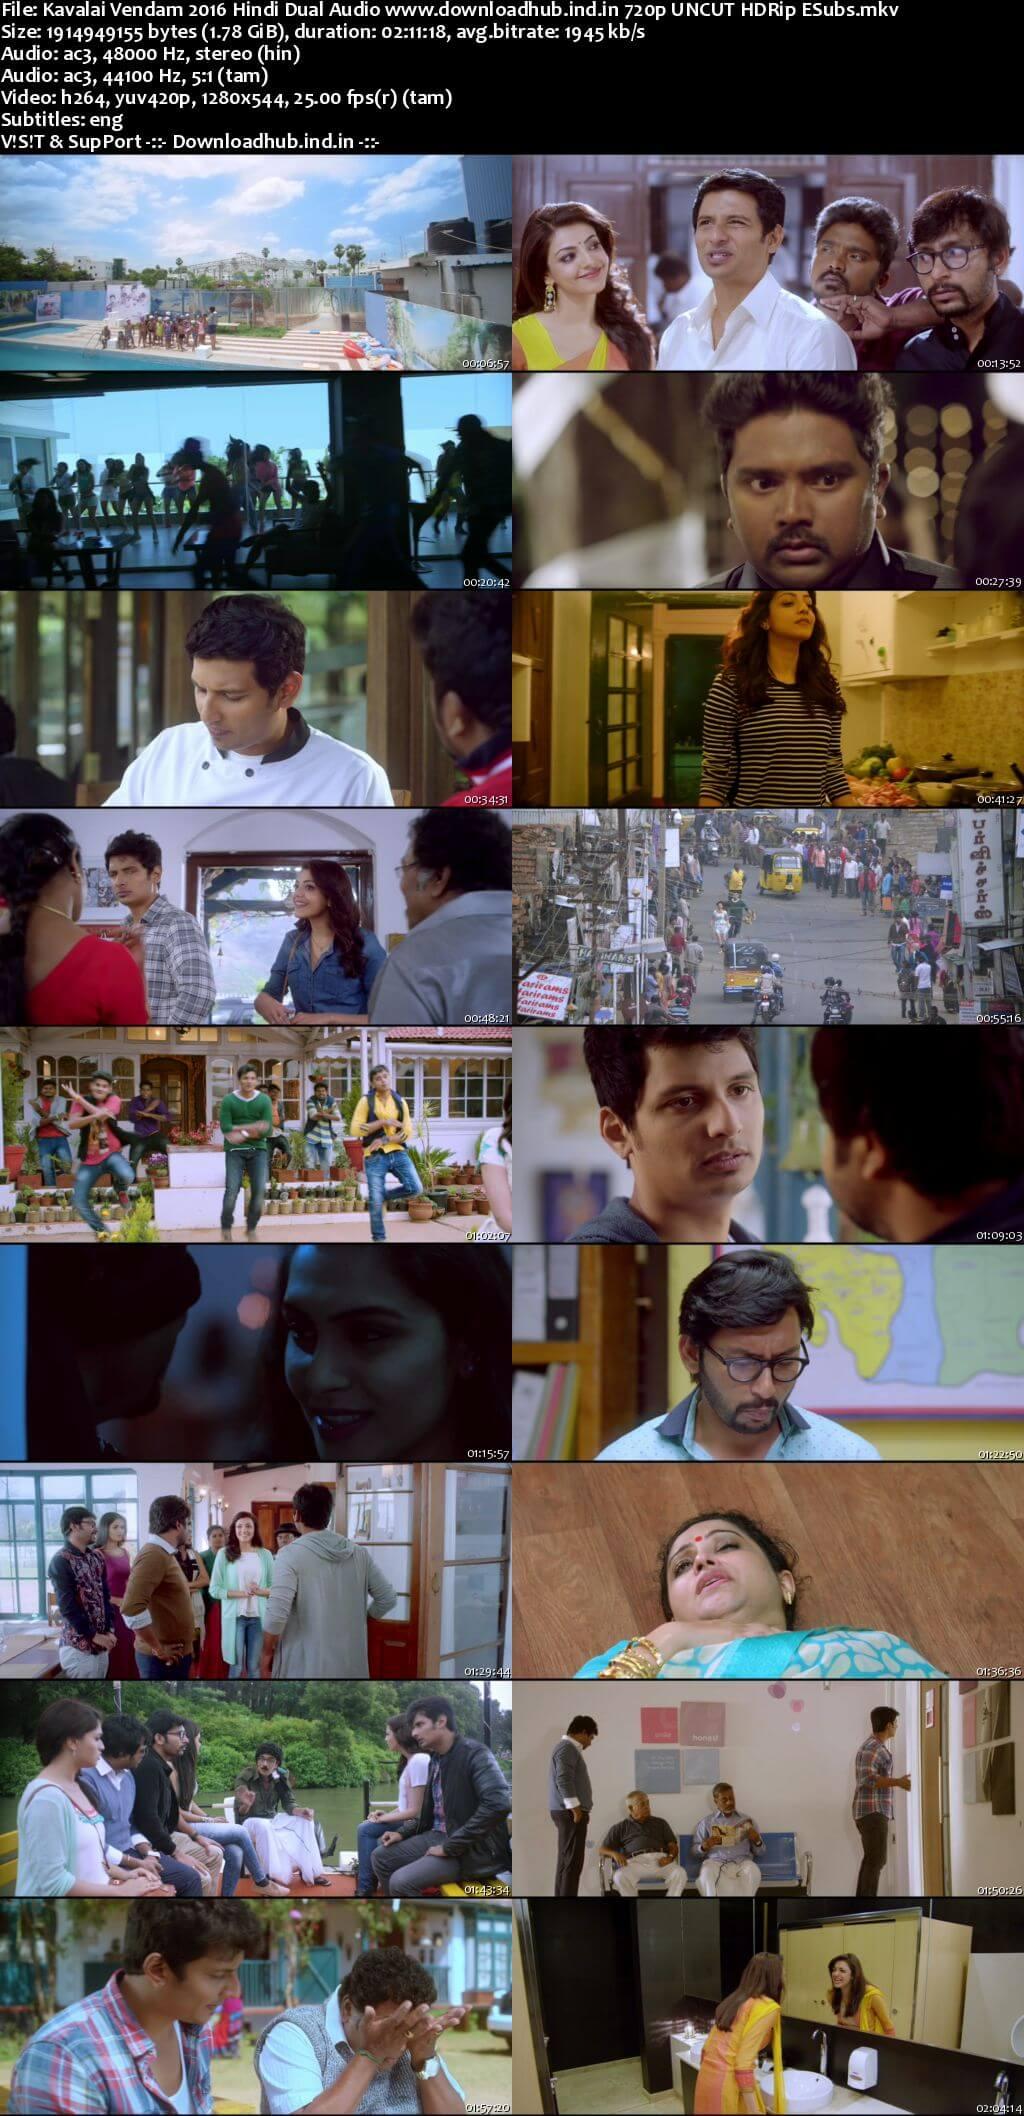 Kavalai Vendam 2016 Hindi Dual Audio 720p UNCUT HDRip ESubs